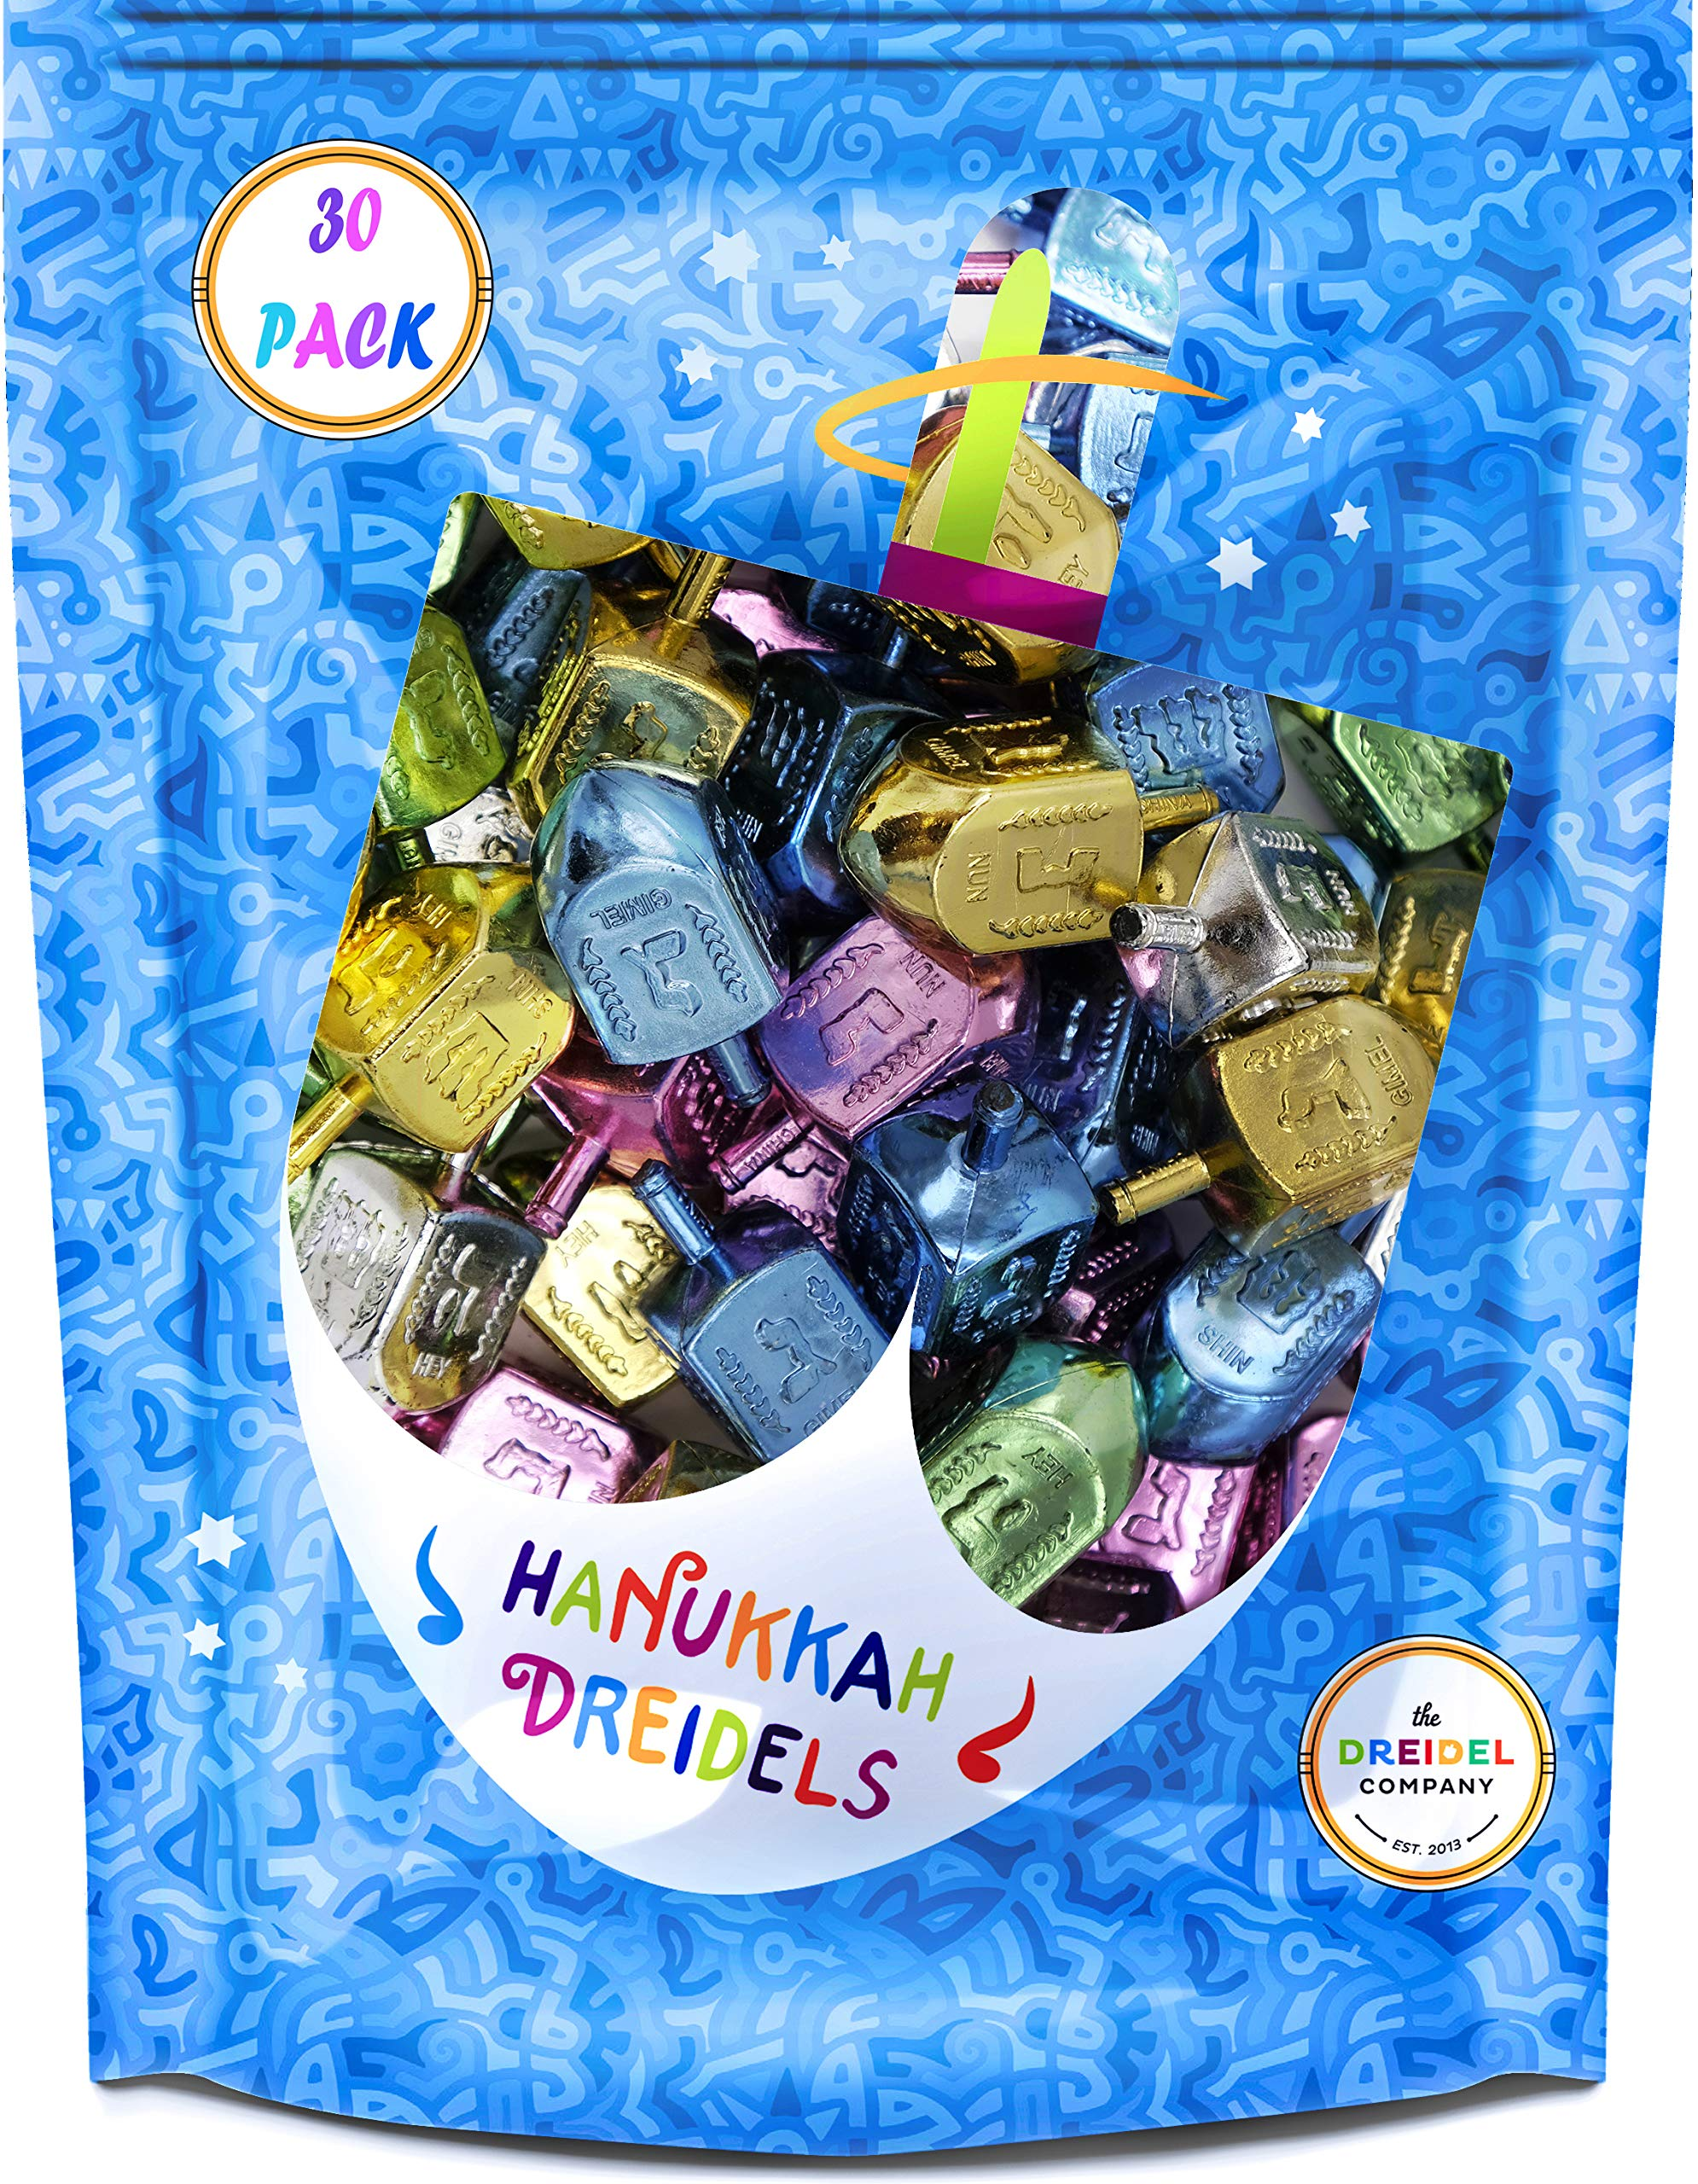 Hanukkah Dreidels Metallic Multi-Colored Draydels with English Translation - Includes 3 Dreidel Game Instruction Cards (30-Pack) by The Dreidel Company (Image #2)